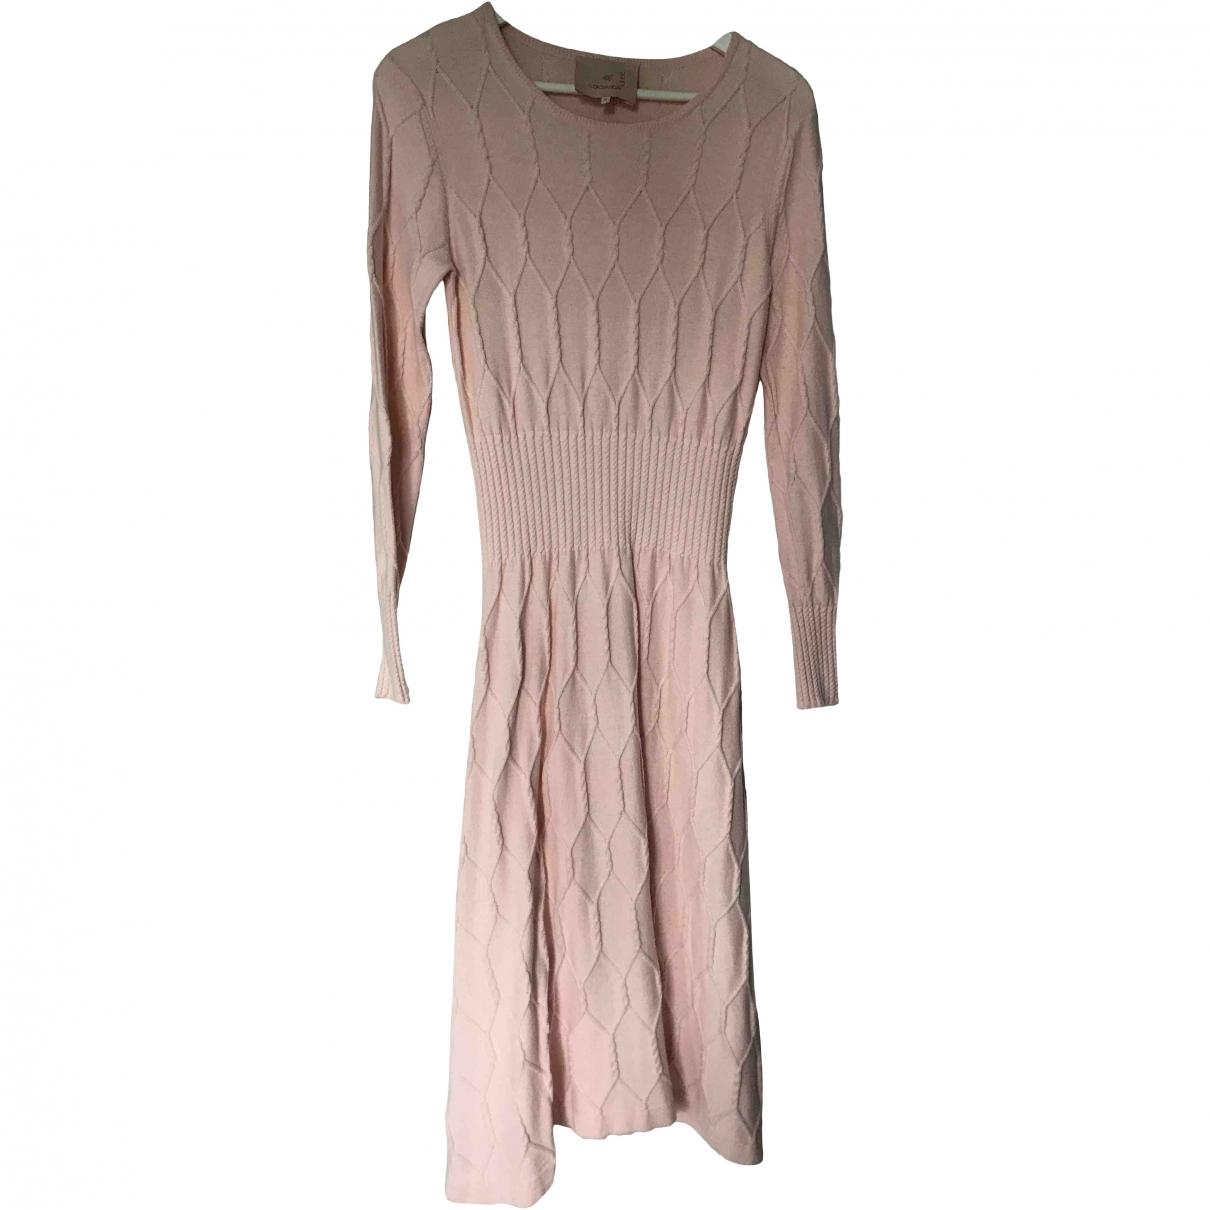 Roksanda Ilincic \N Pink Cotton dress for Women 8 UK